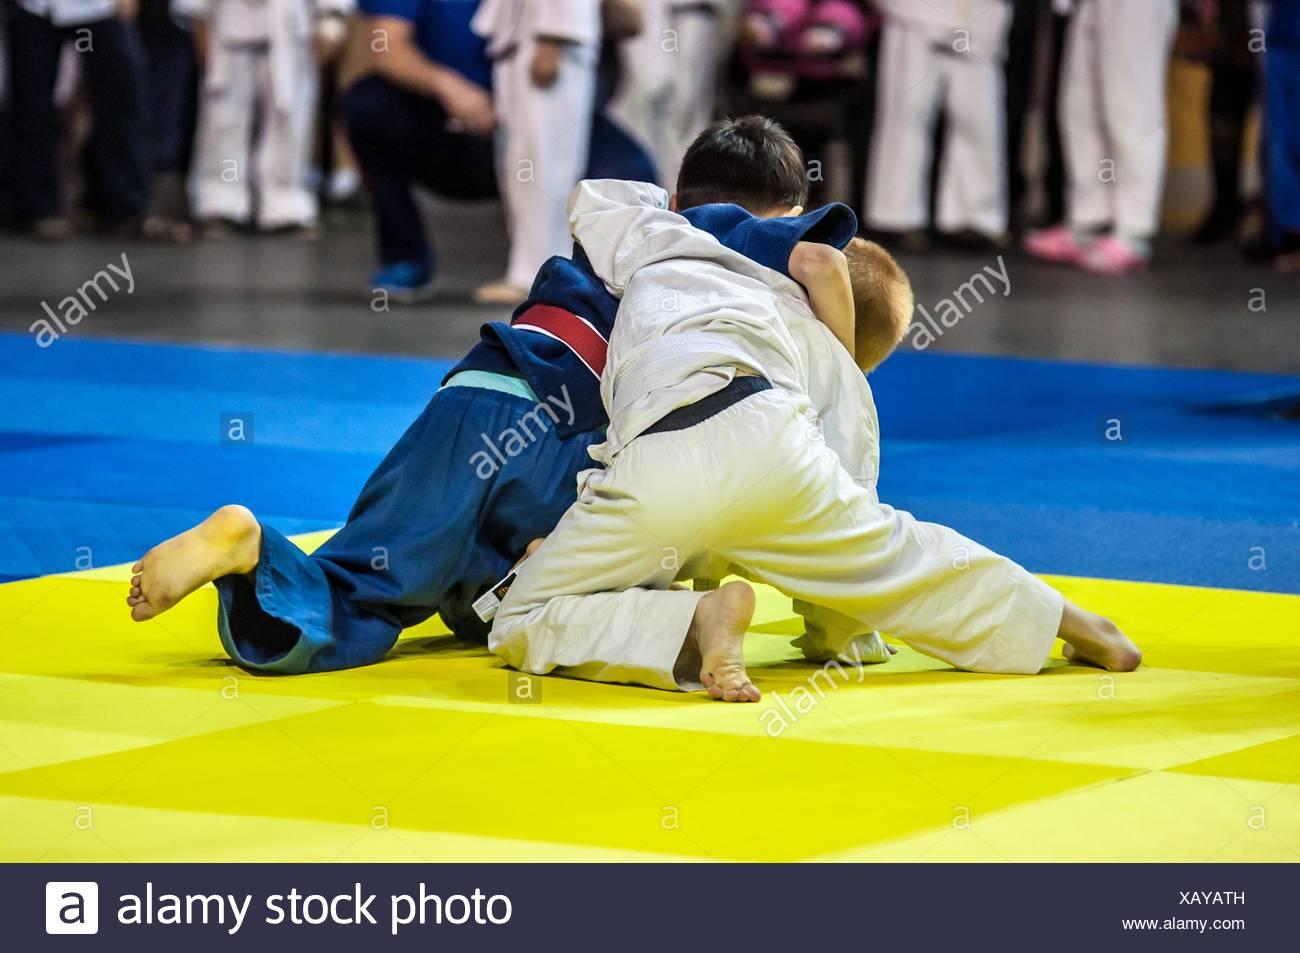 Two judoka on the tatami. Stock Photo